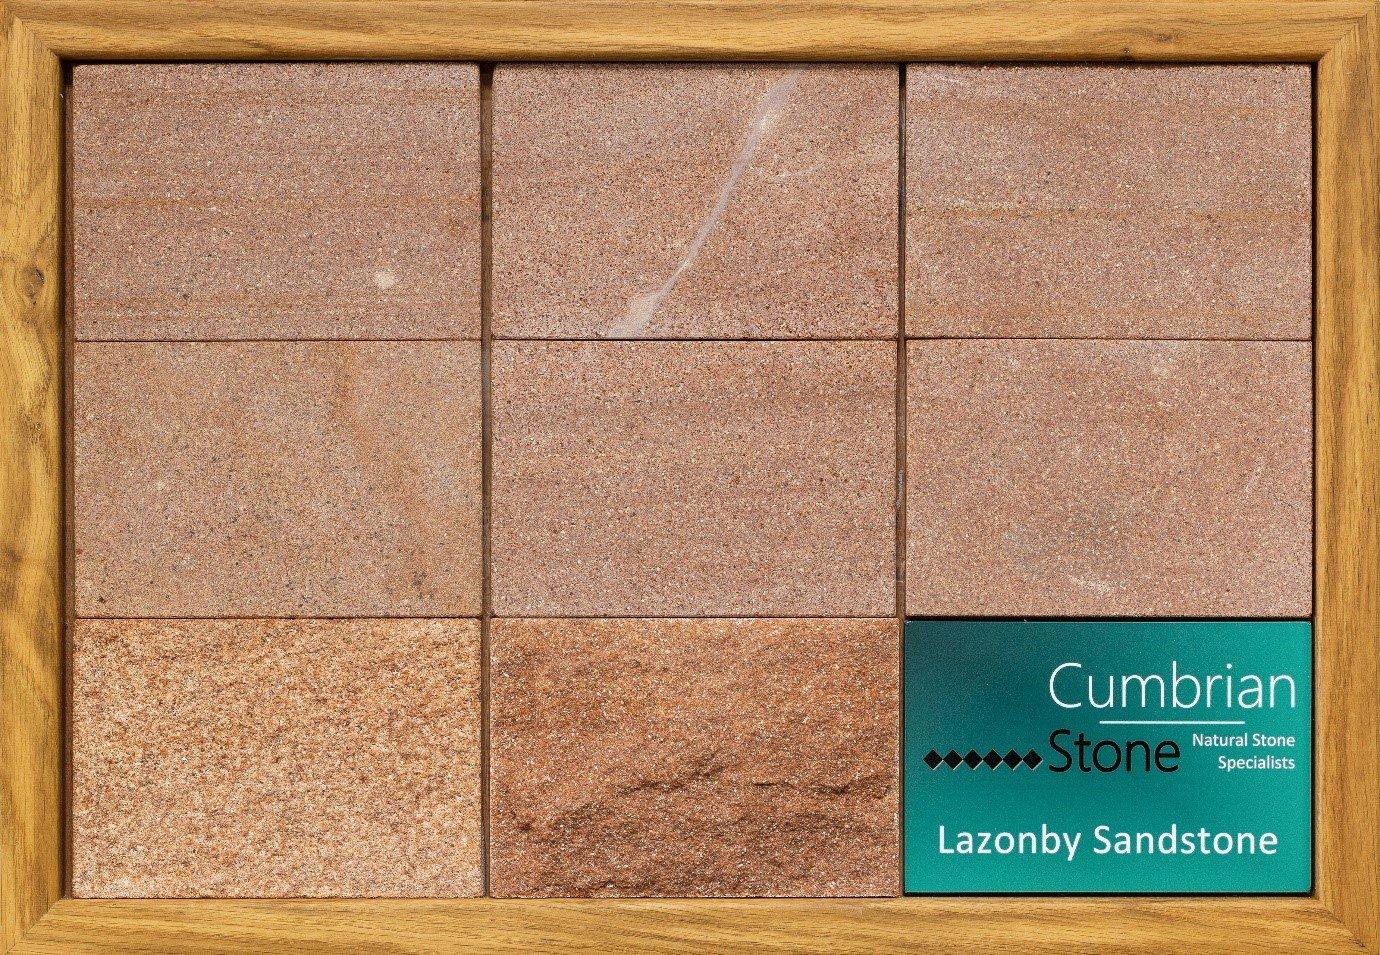 Lazonby Sandstone Variations